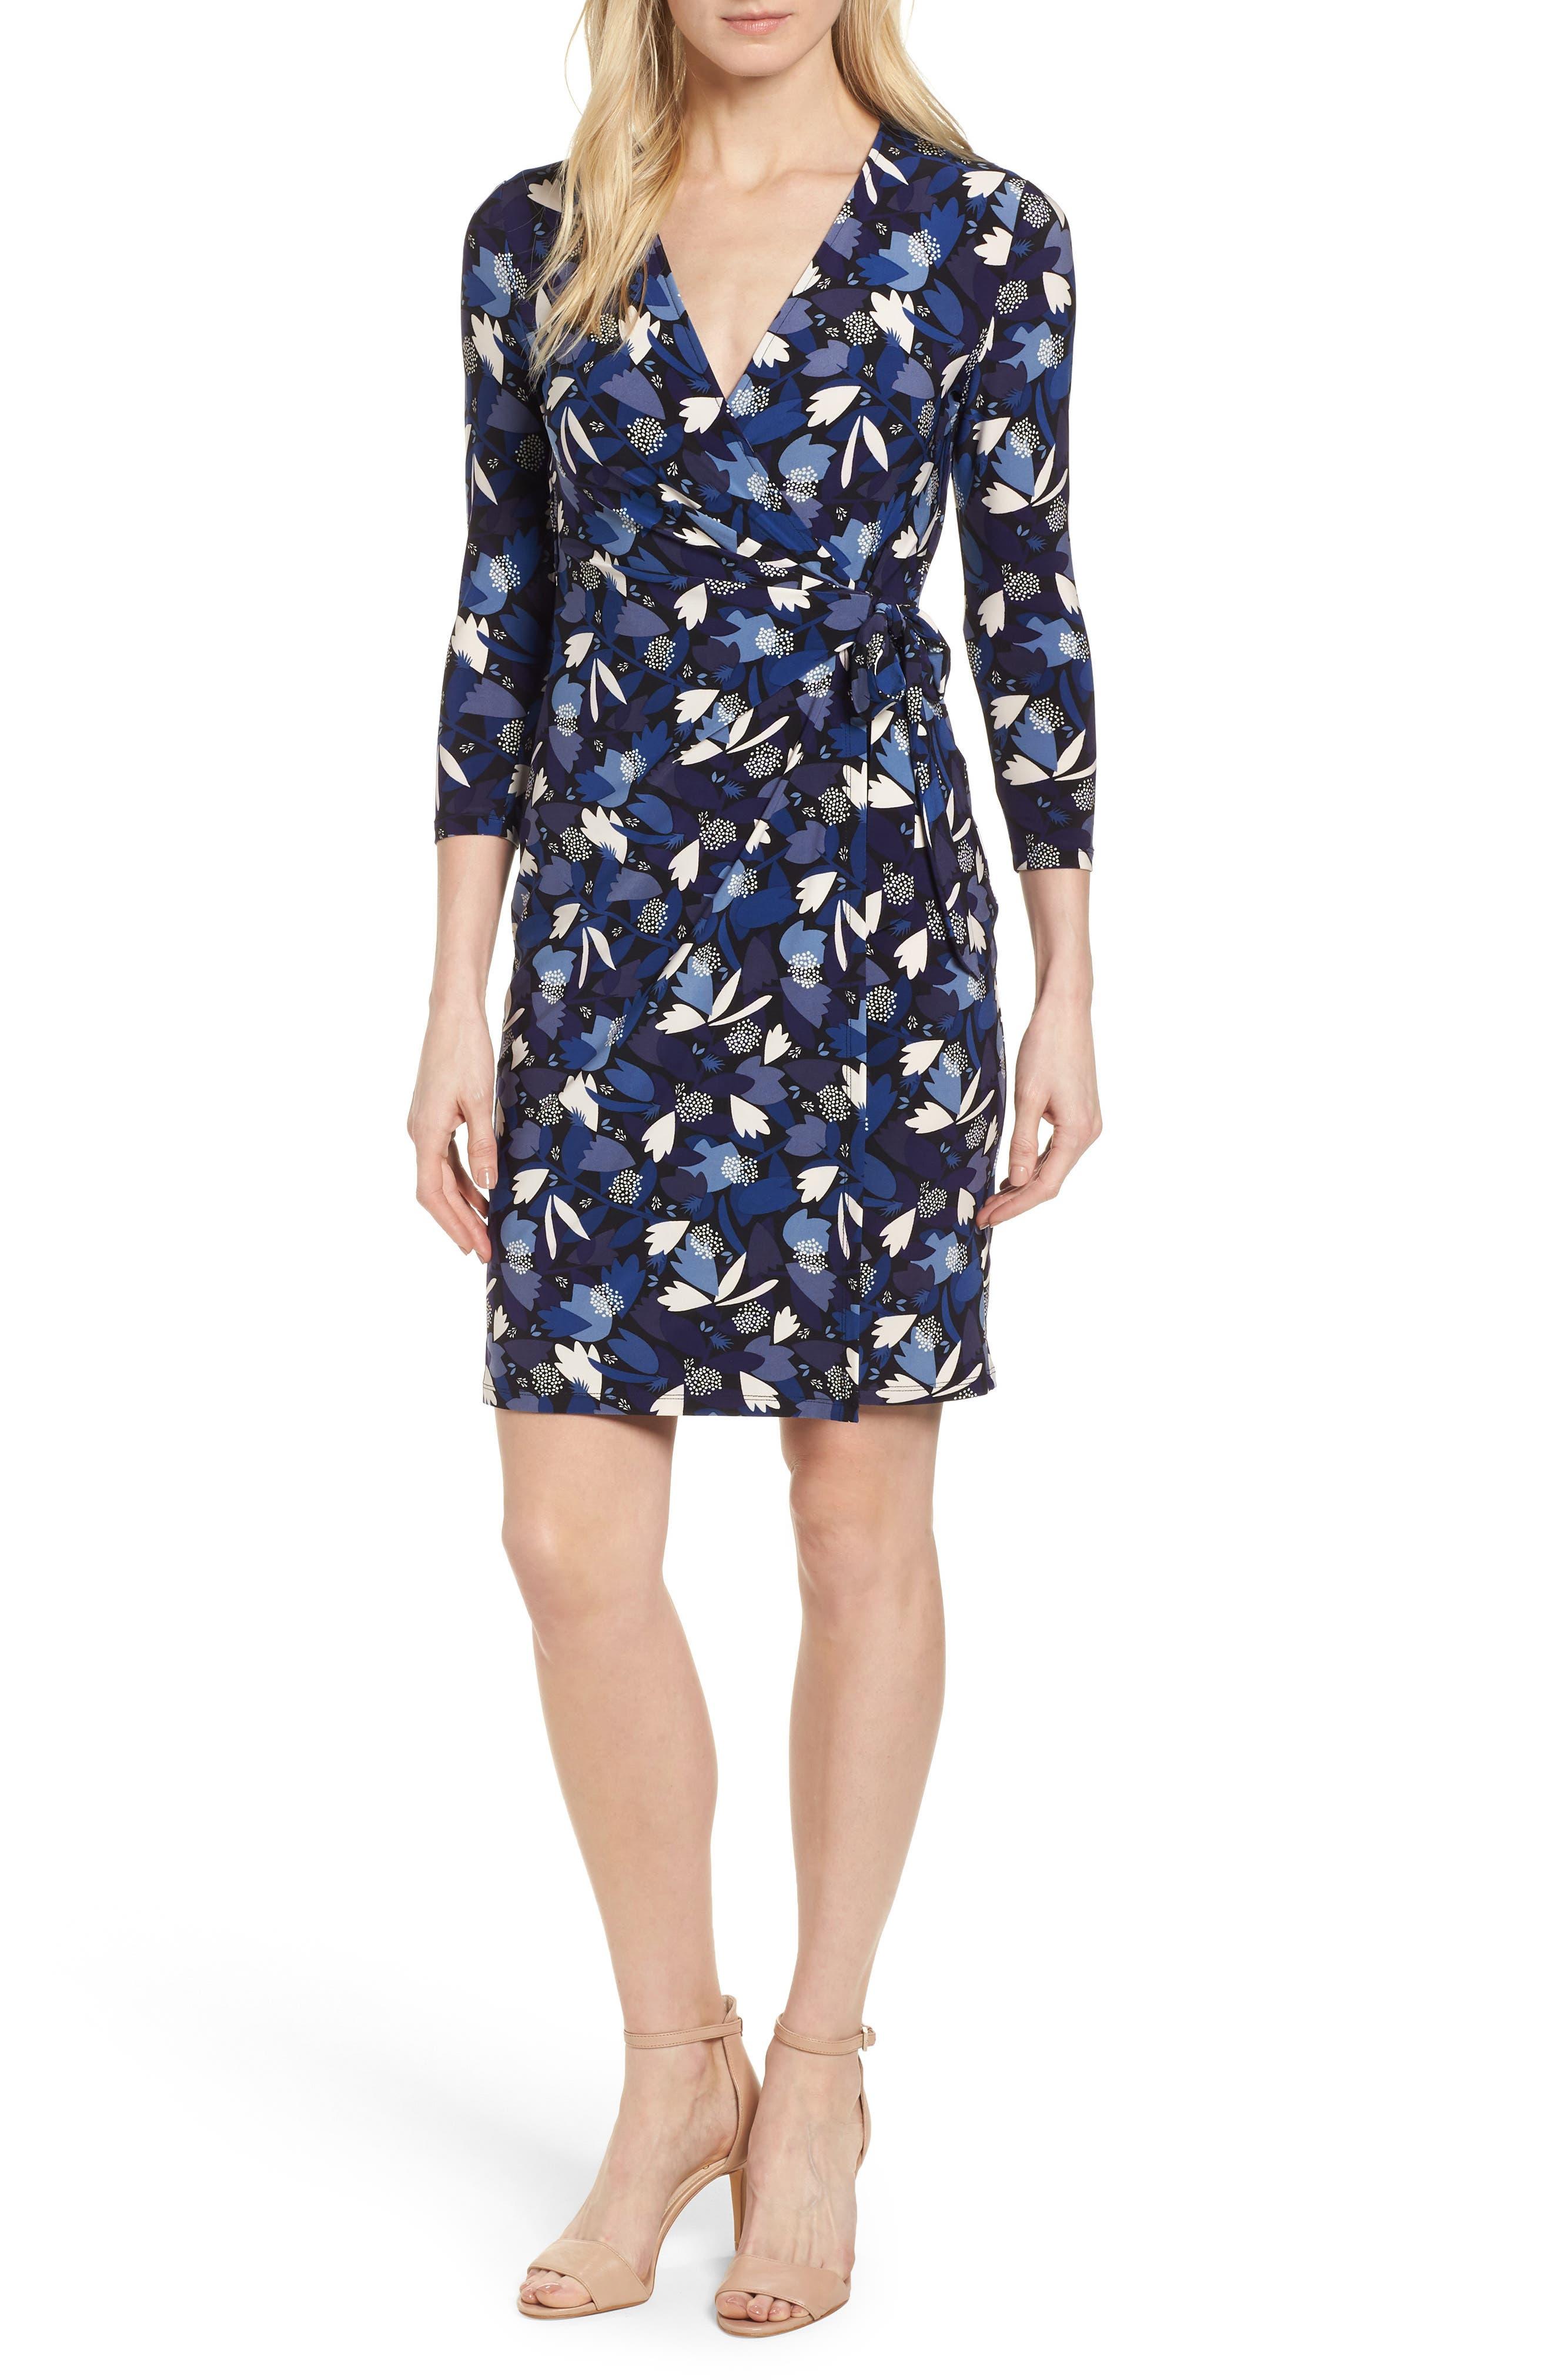 New York Amalfi Print Classic Wrap Dress,                         Main,                         color, Black/ Monaco Combo